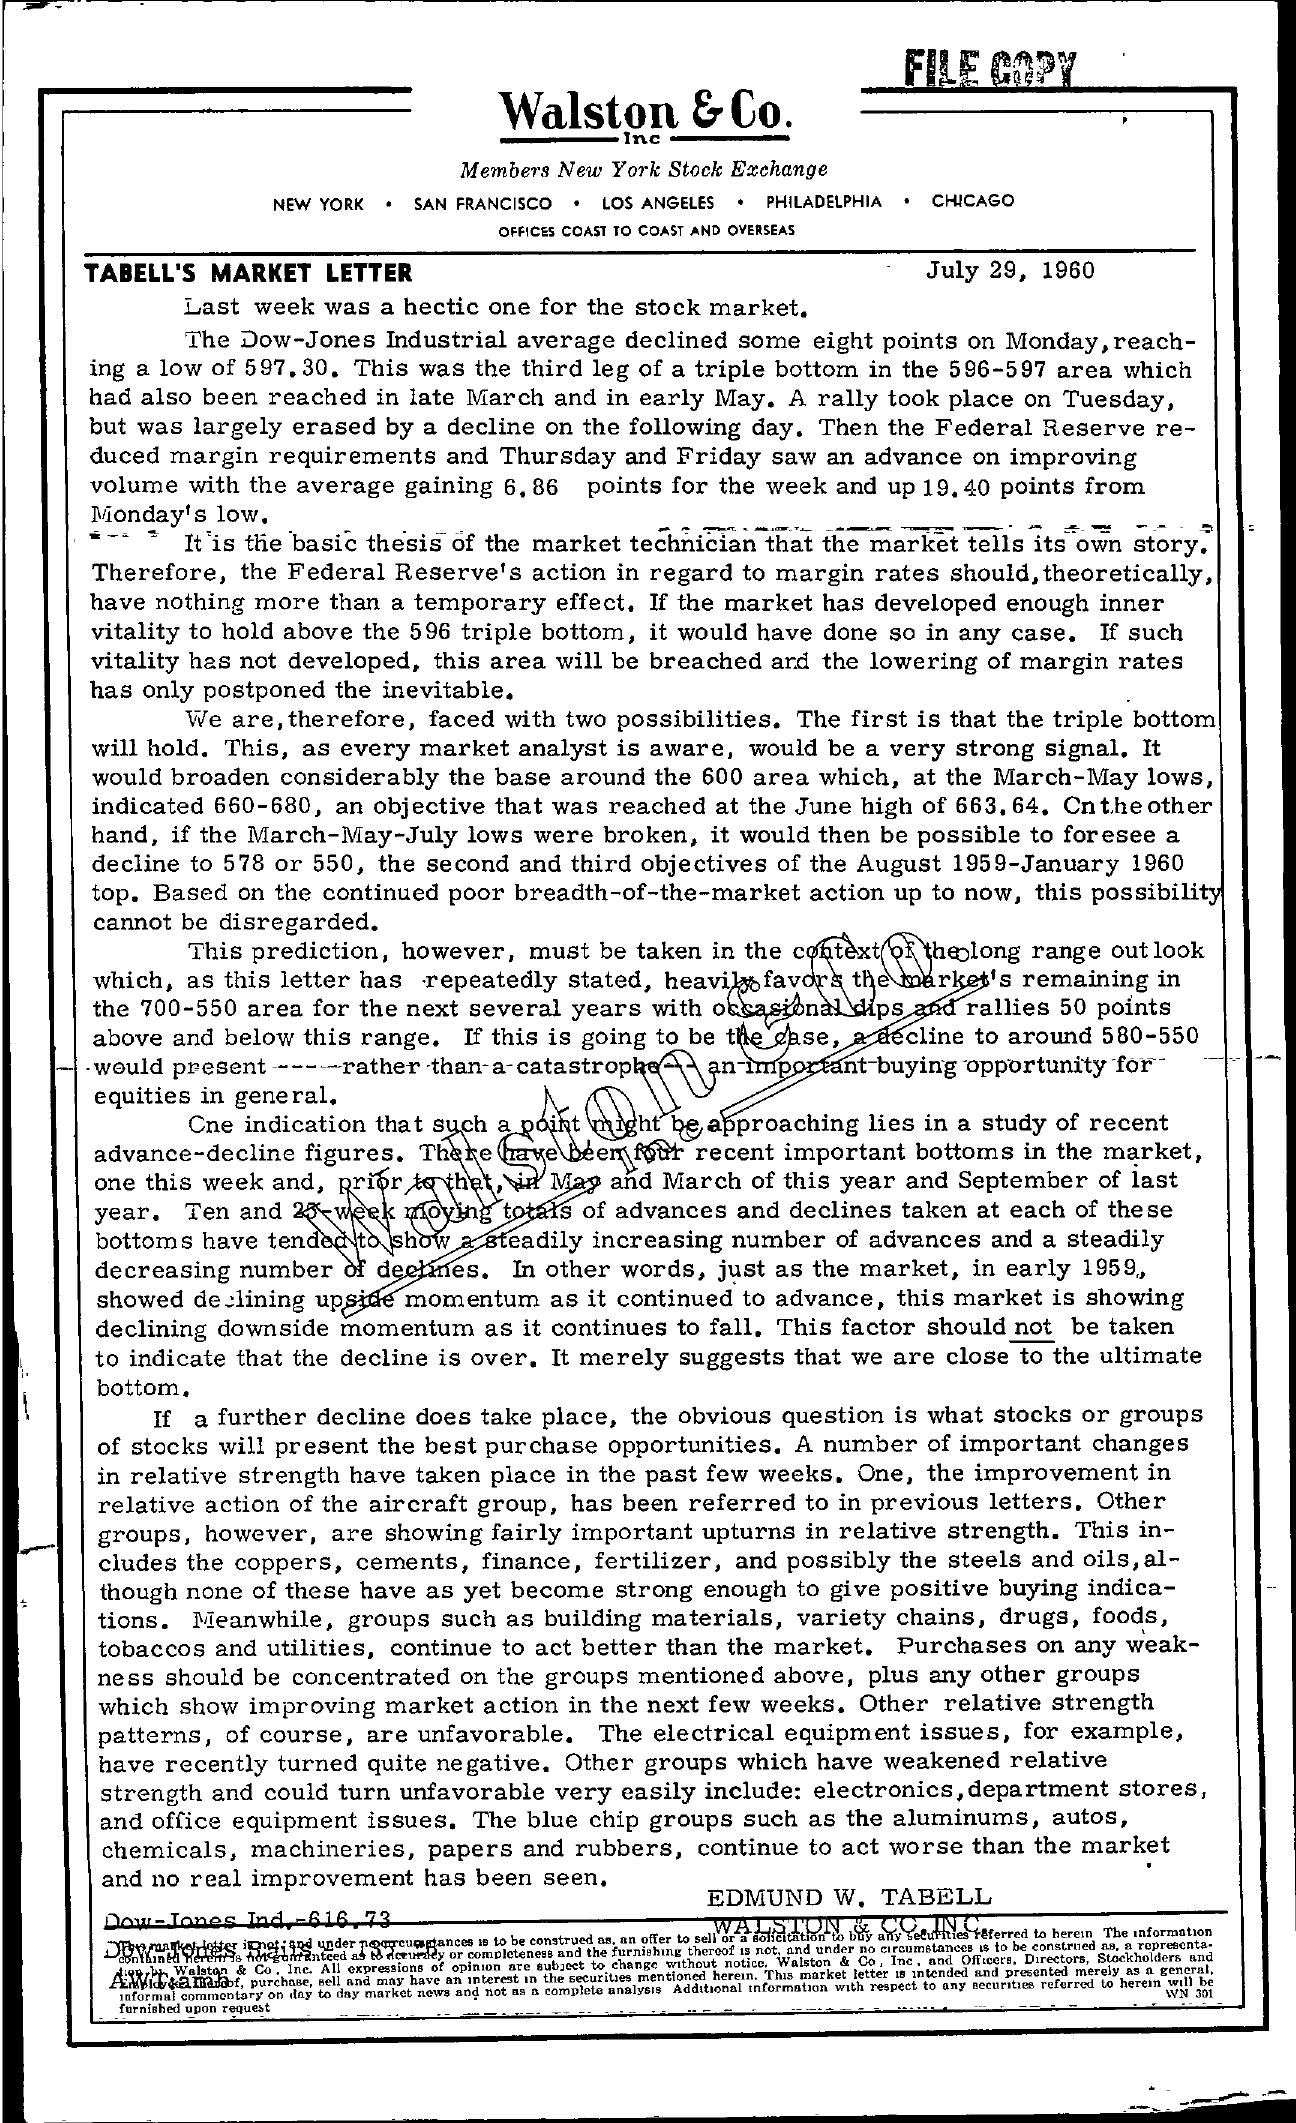 Tabell's Market Letter - July 29, 1960